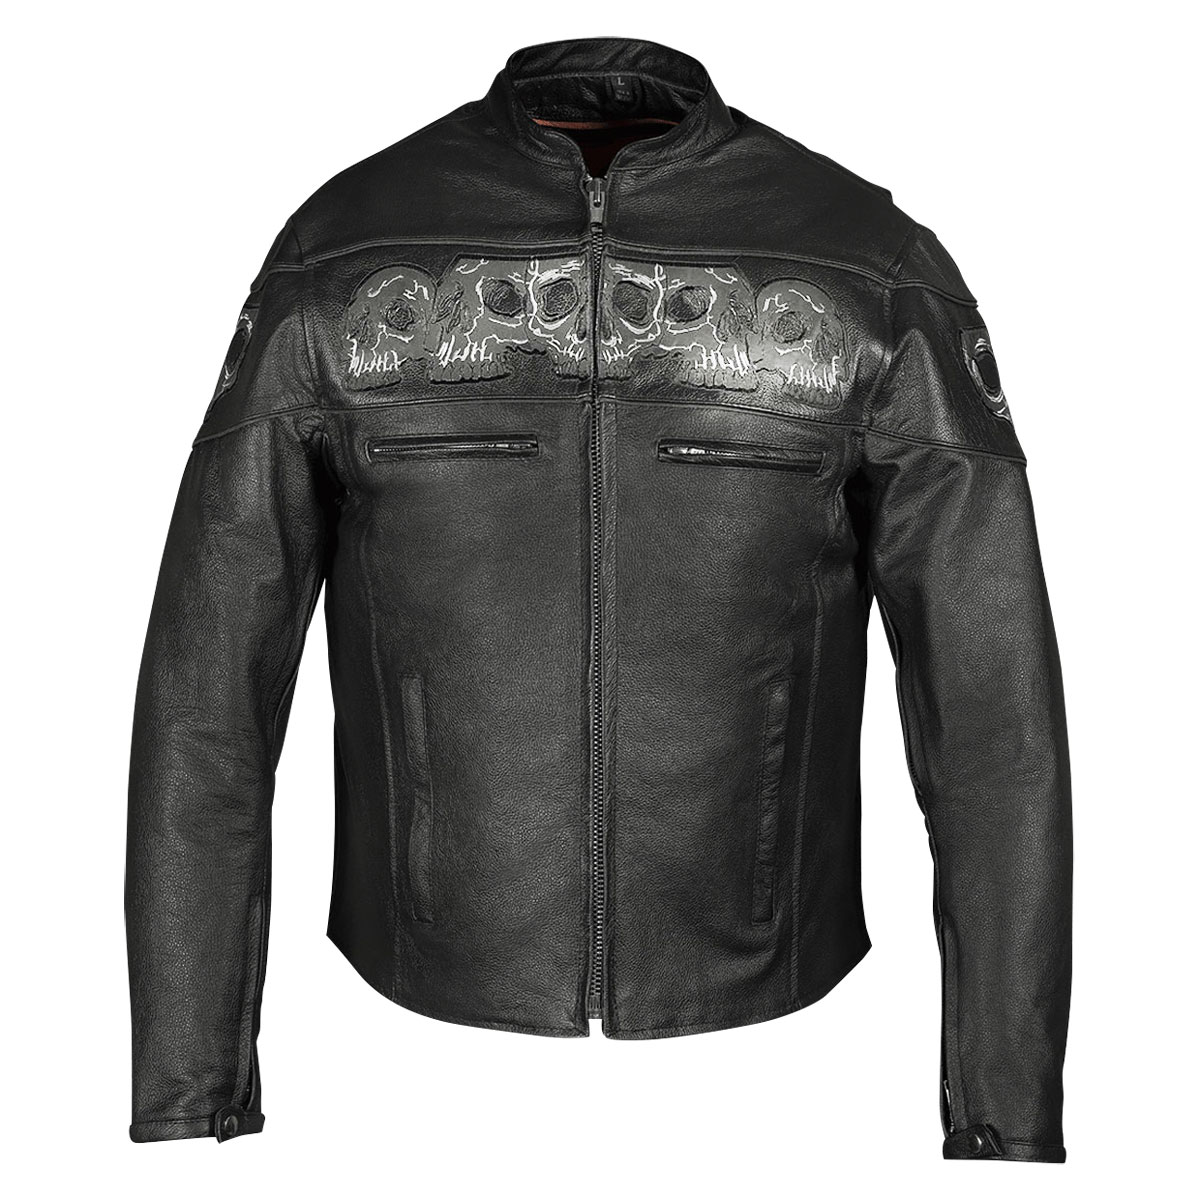 Vance Leathers Men's Reflective Skulls Black Leather Jacket